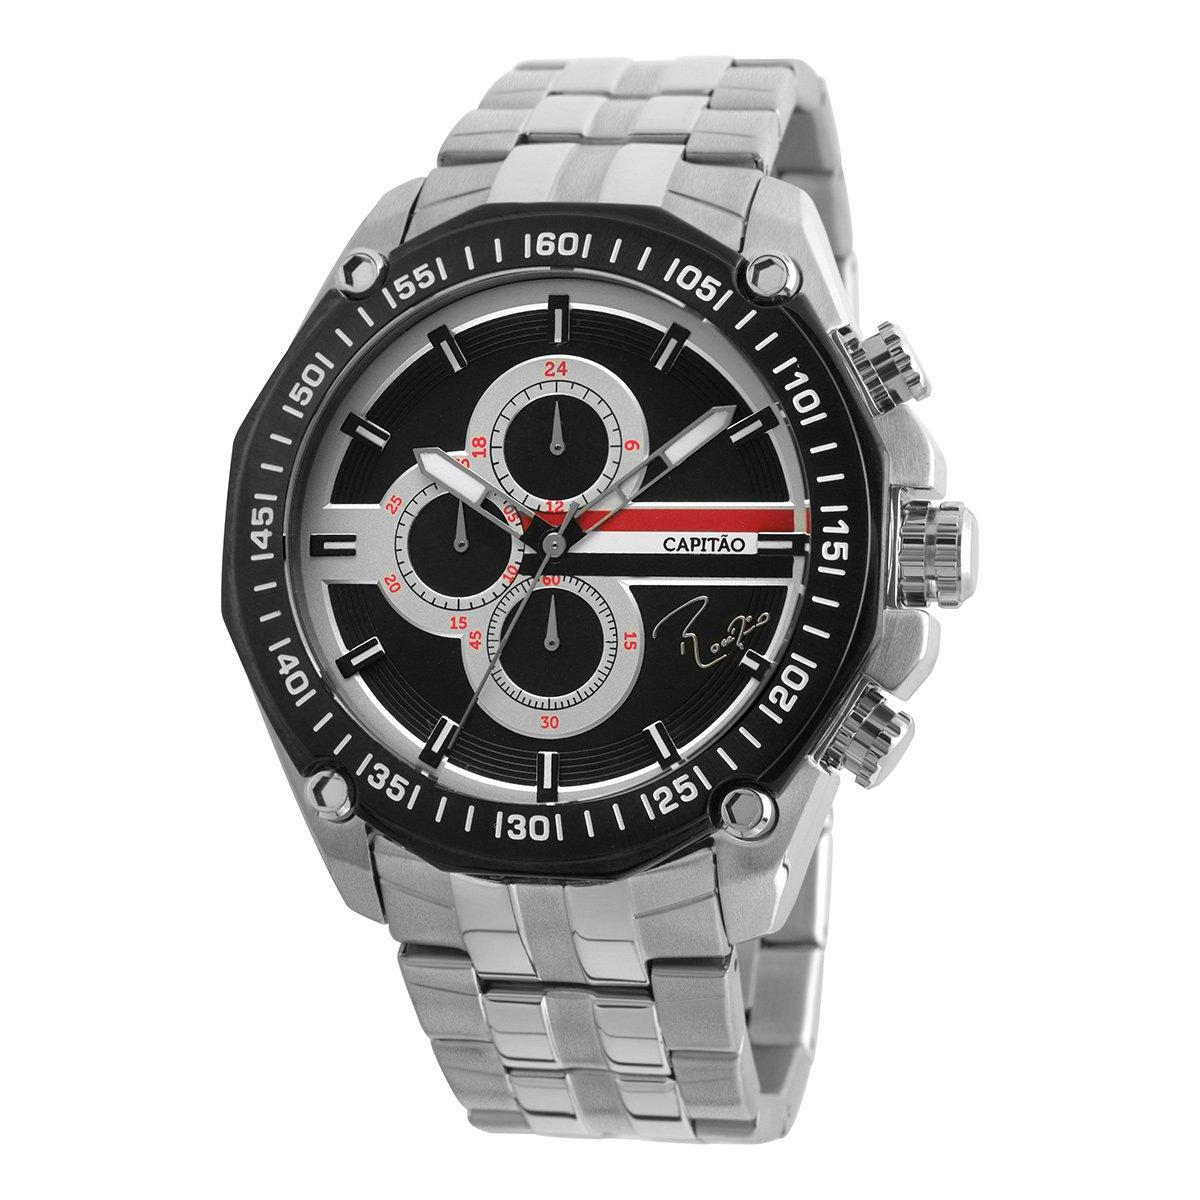 b69fb839bf8 Relógio Technos São Paulo Rogério Ceni Capitão Analógico Cronógrafo II - Compre  Agora